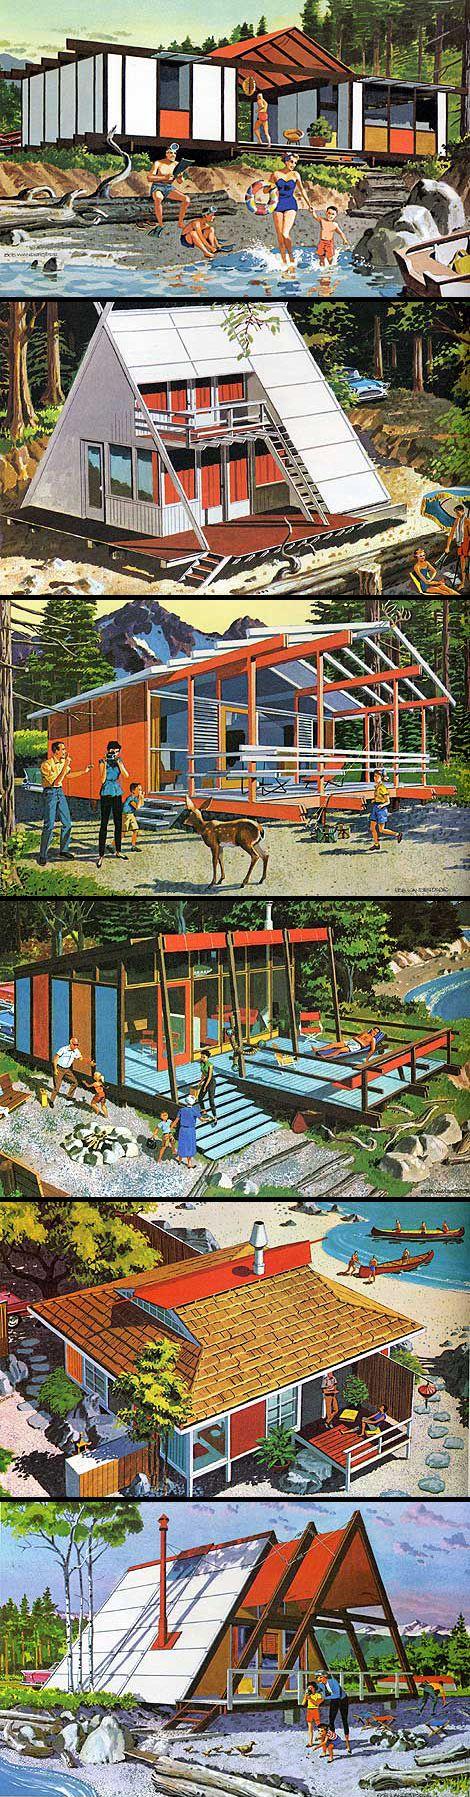 Mid-Century Modern Vacation Home Plans, via grainedit.com/2009/05/25/mid-century-modern-home-plans: